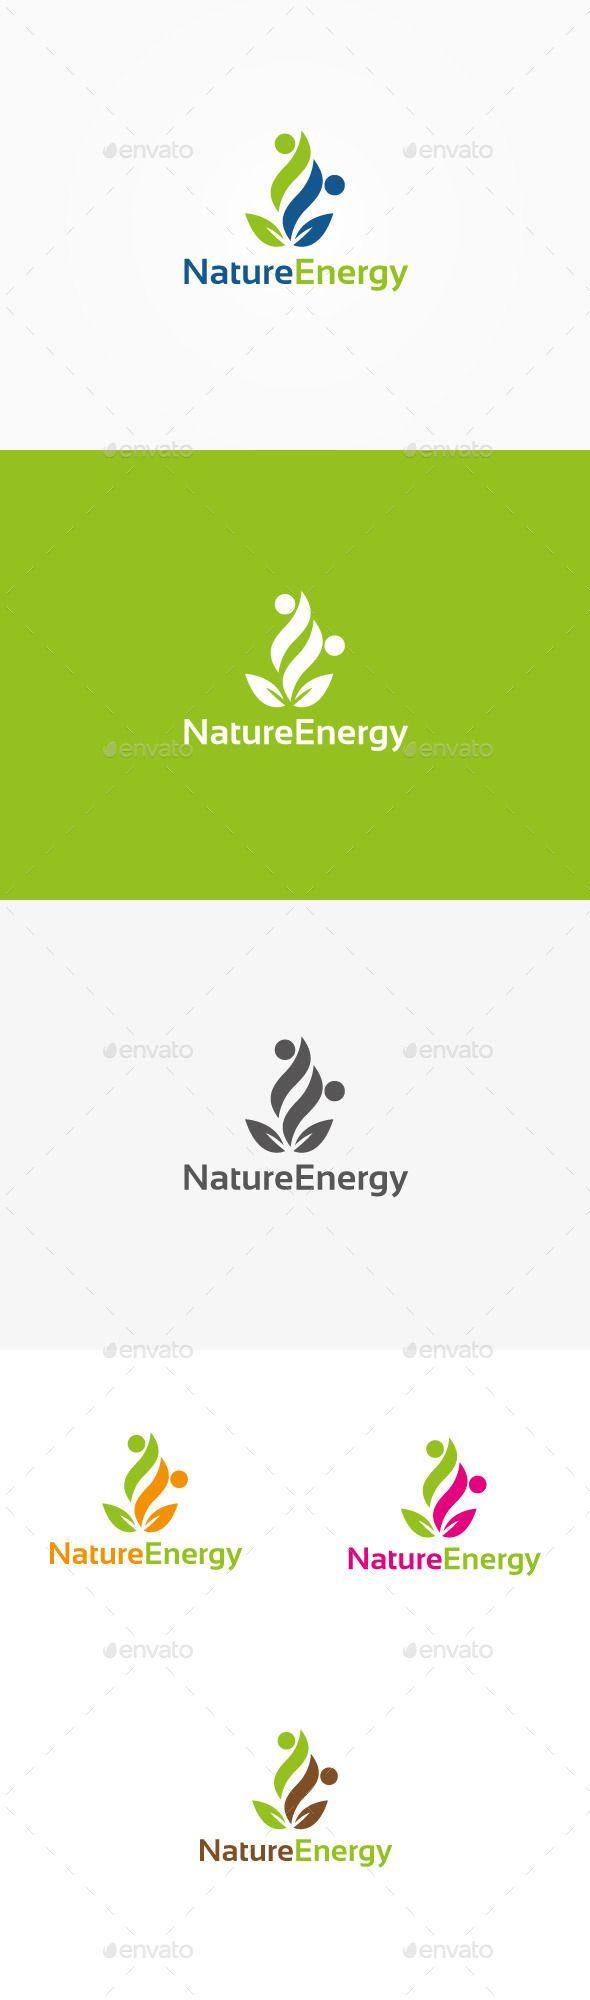 Nature Energy - Logo Design Template Vector #logotype Download it here: http://graphicriver.net/item/nature-energy-logo/9942886?s_rank=1450?ref=nesto https://www.kznwedding.dj